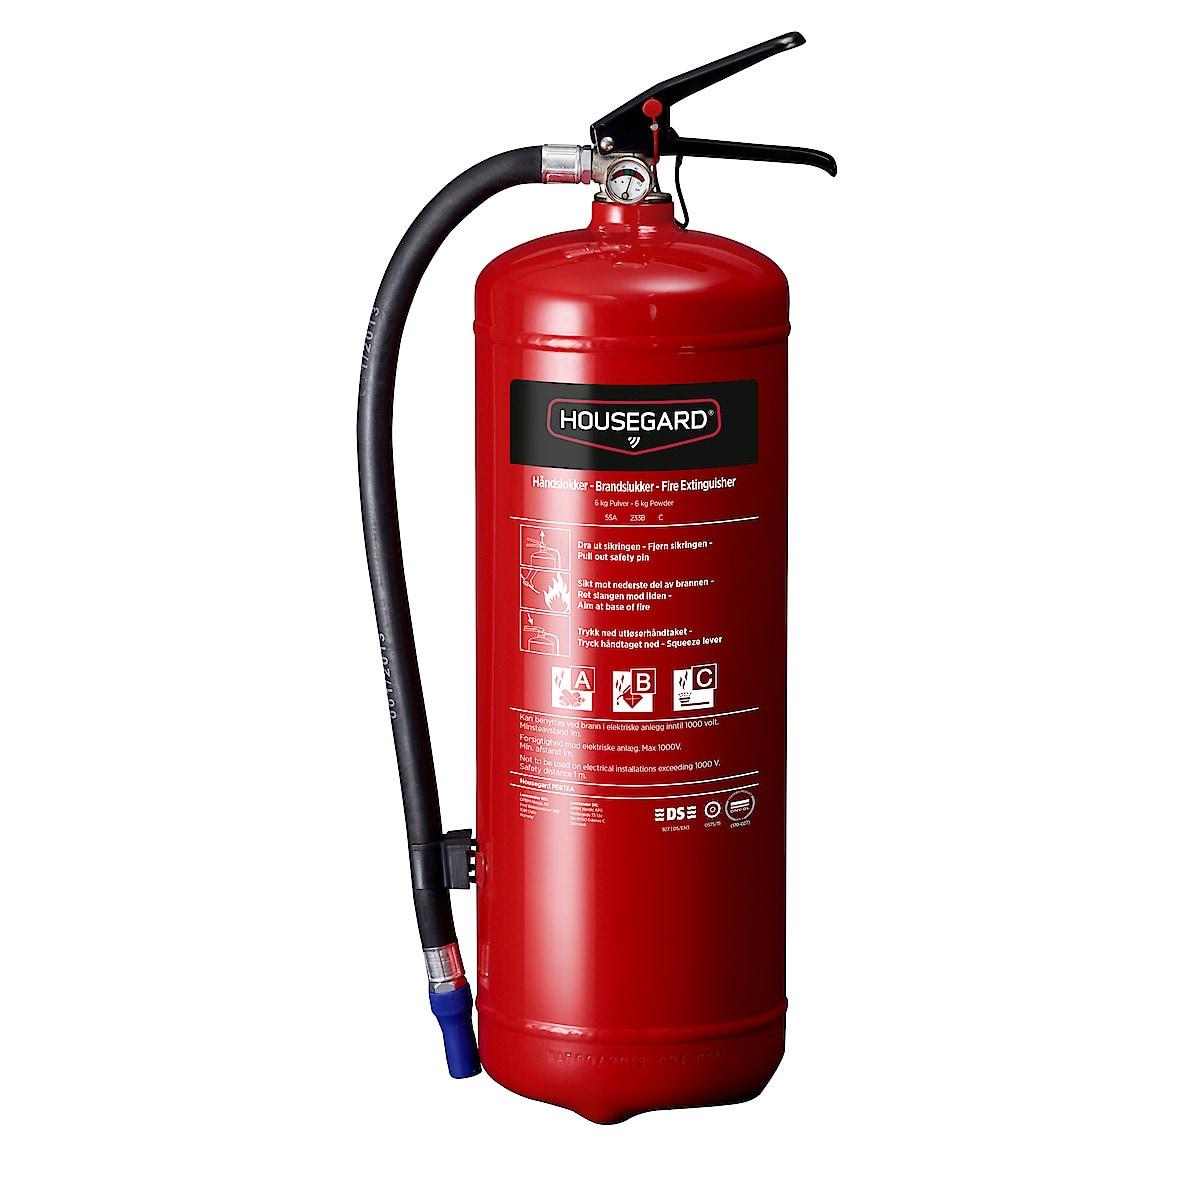 Housegard brannslukker 6 kg 55A